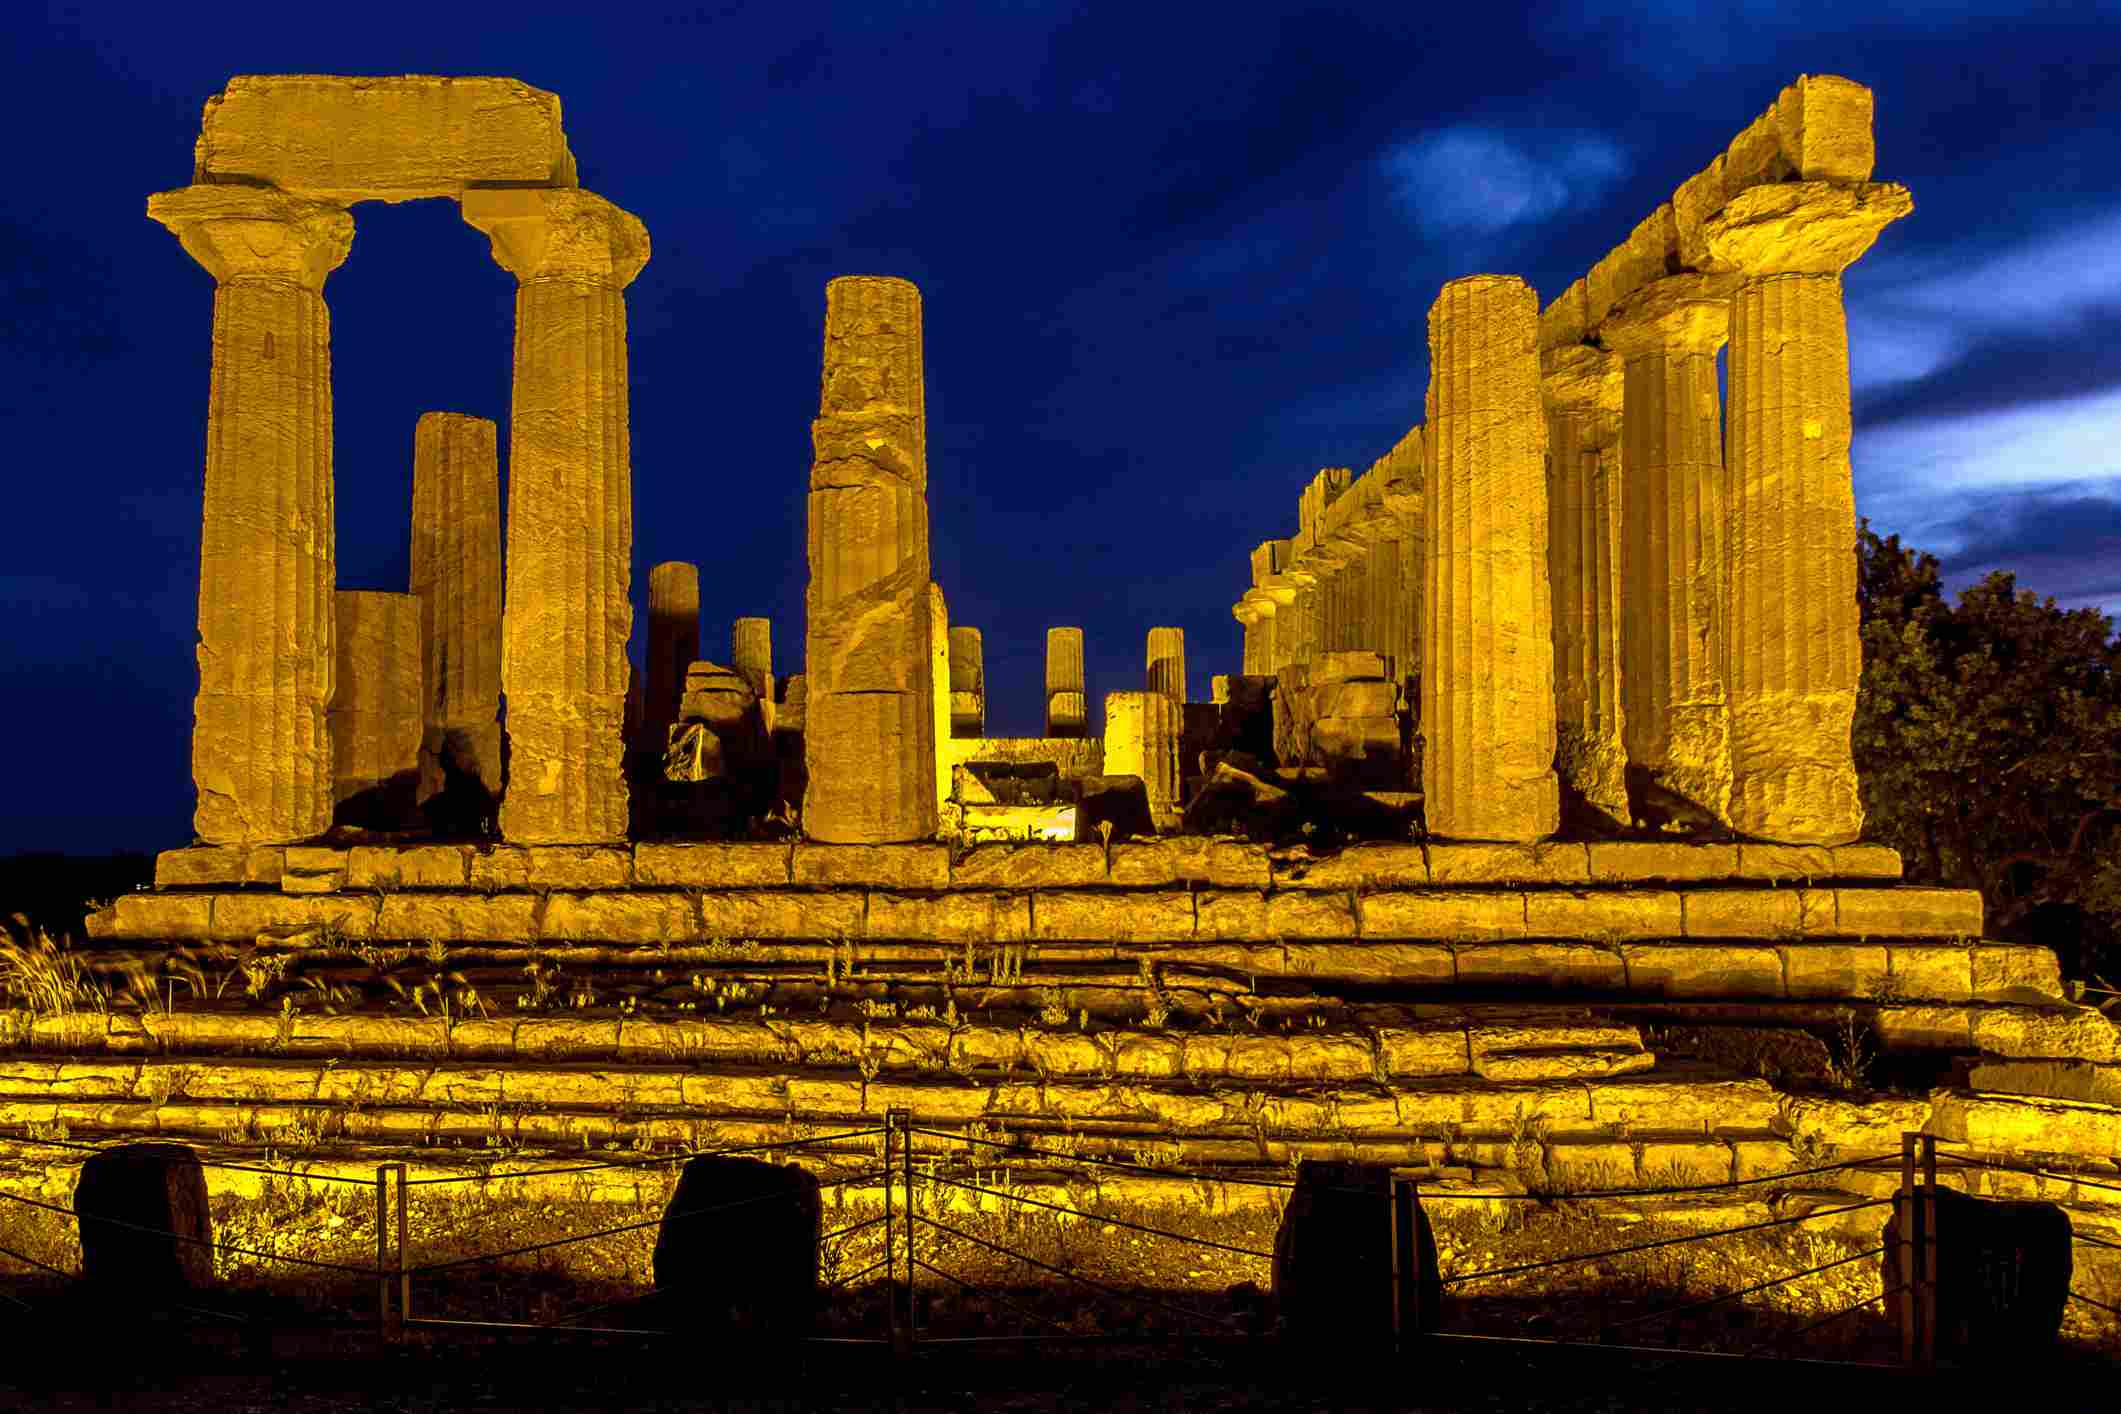 temple of Hera at night